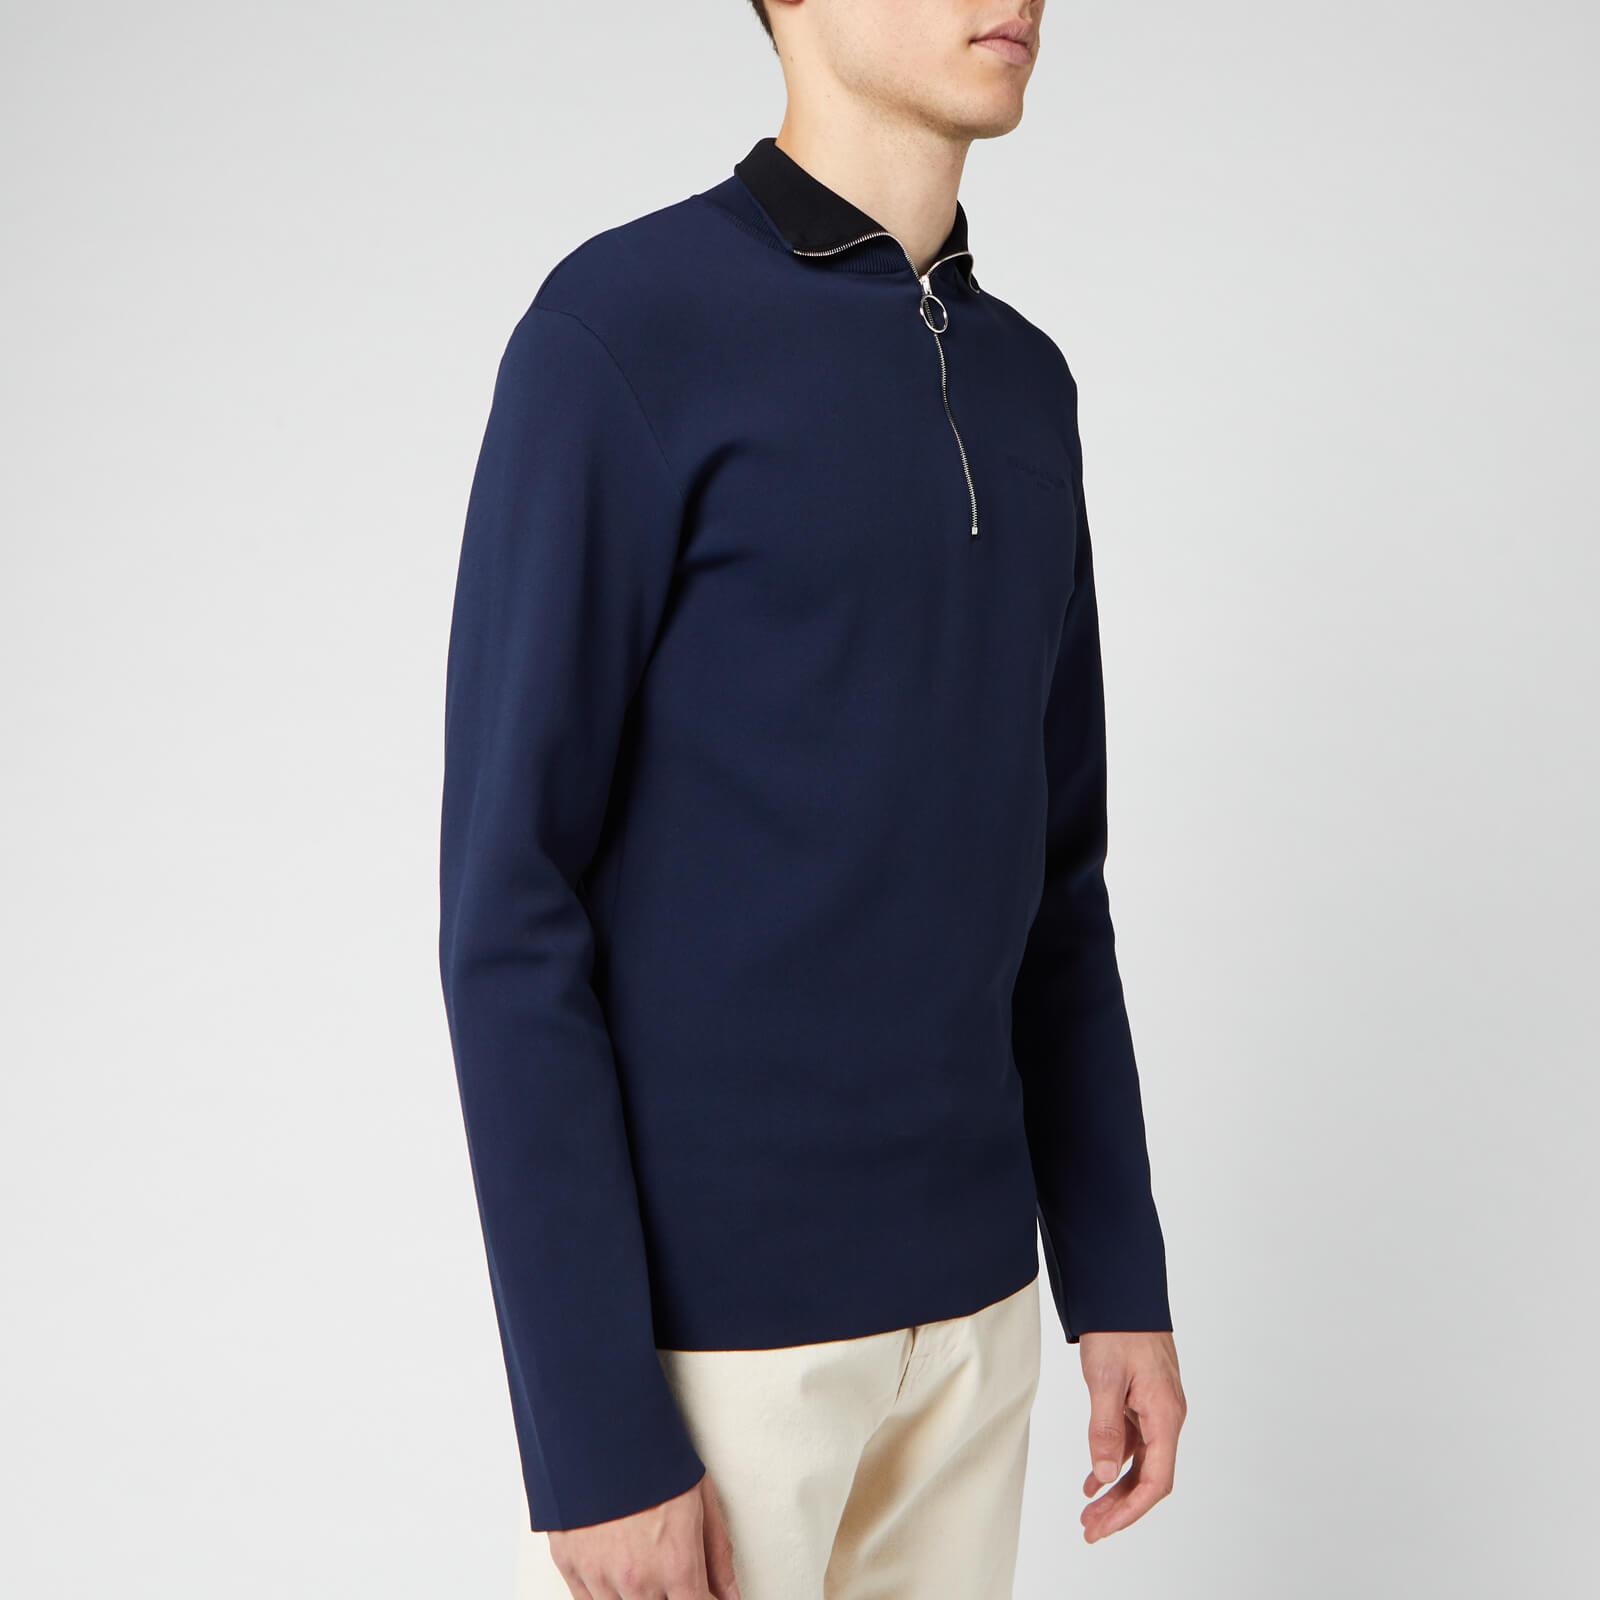 Maison Kitsuné Men's Technical Zipped Collar Pullover - Dark Navy - M - Blue